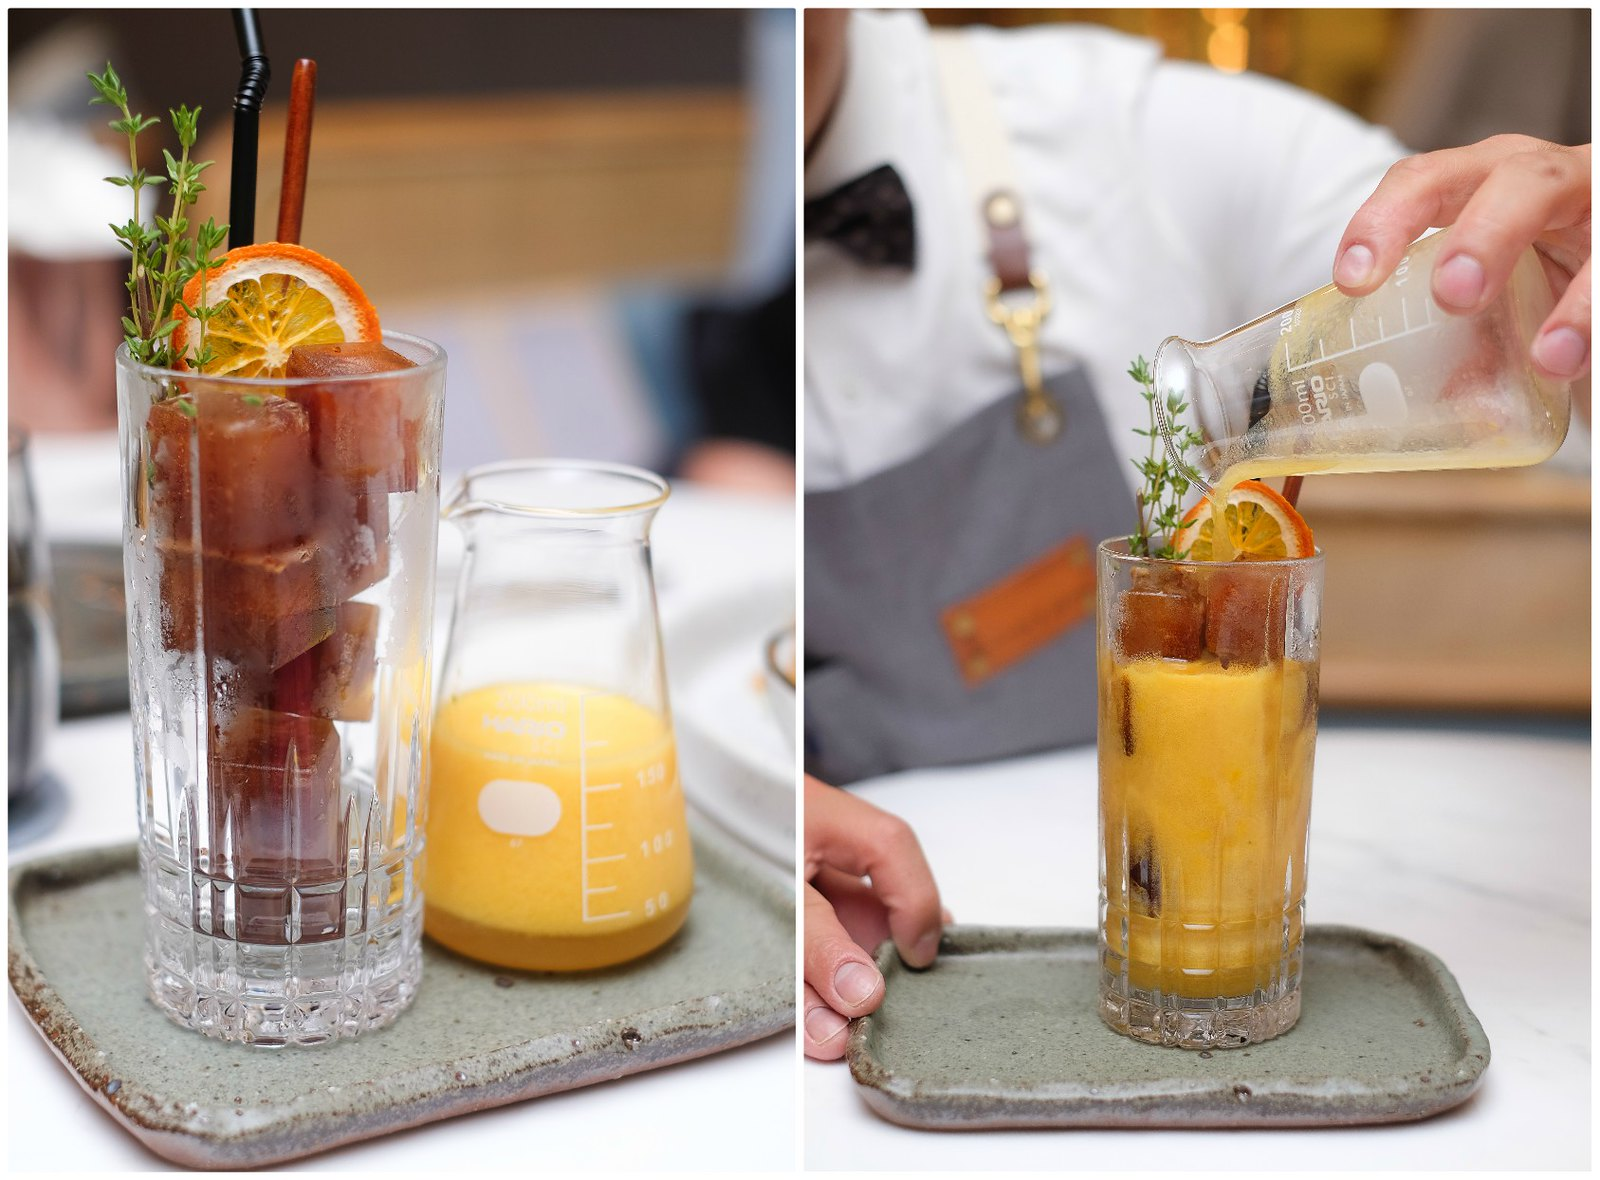 Halcyon & Crane Orange Juice Coffee Cubes